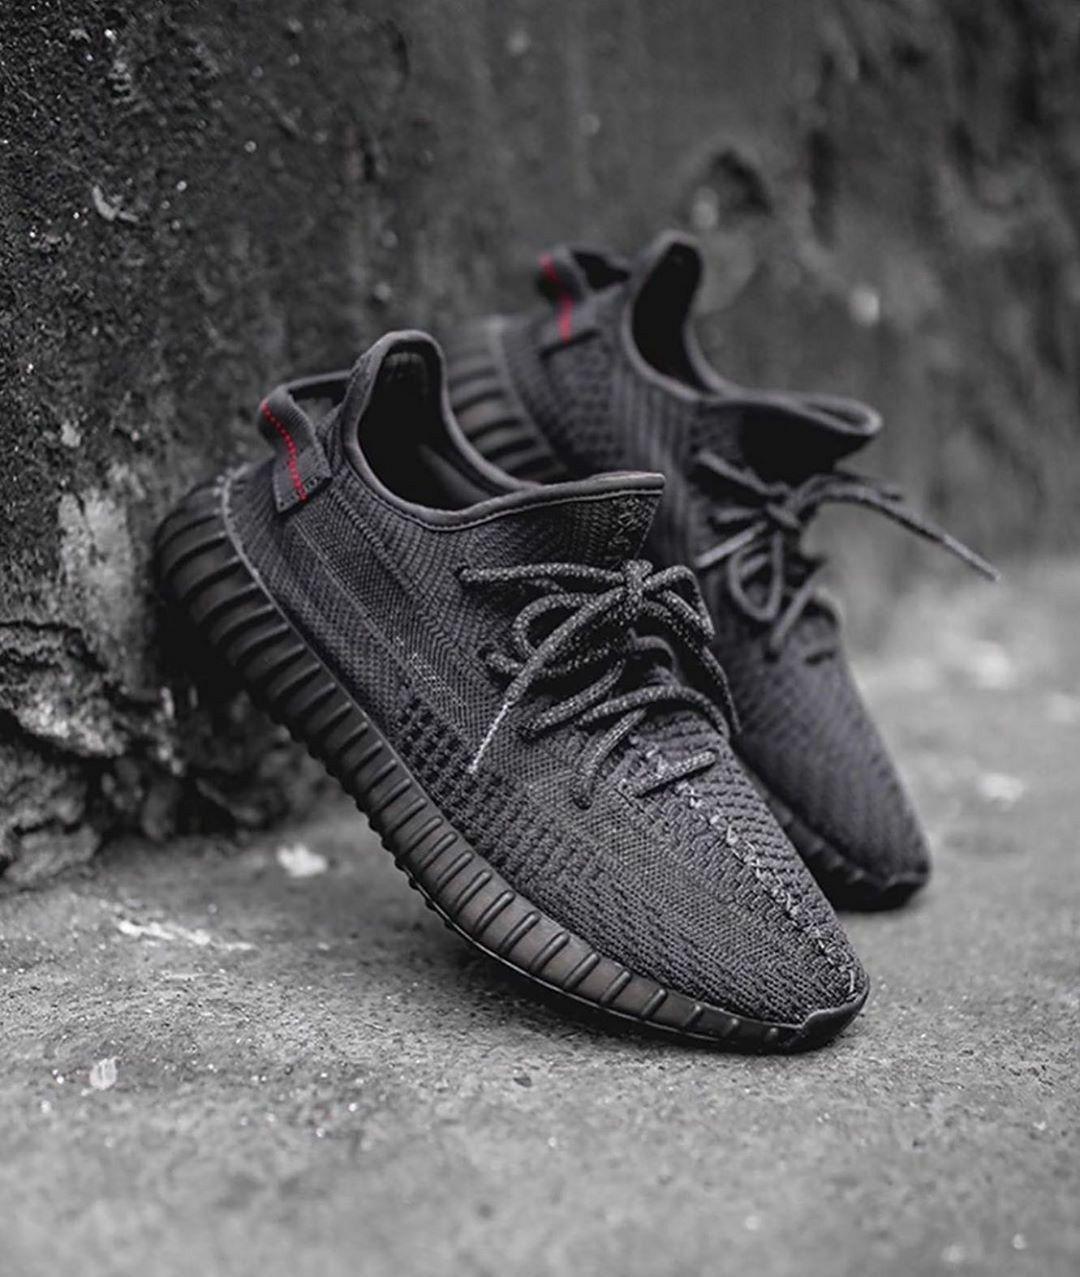 Adidas Yeezy Boost 350 V2 'Static Black